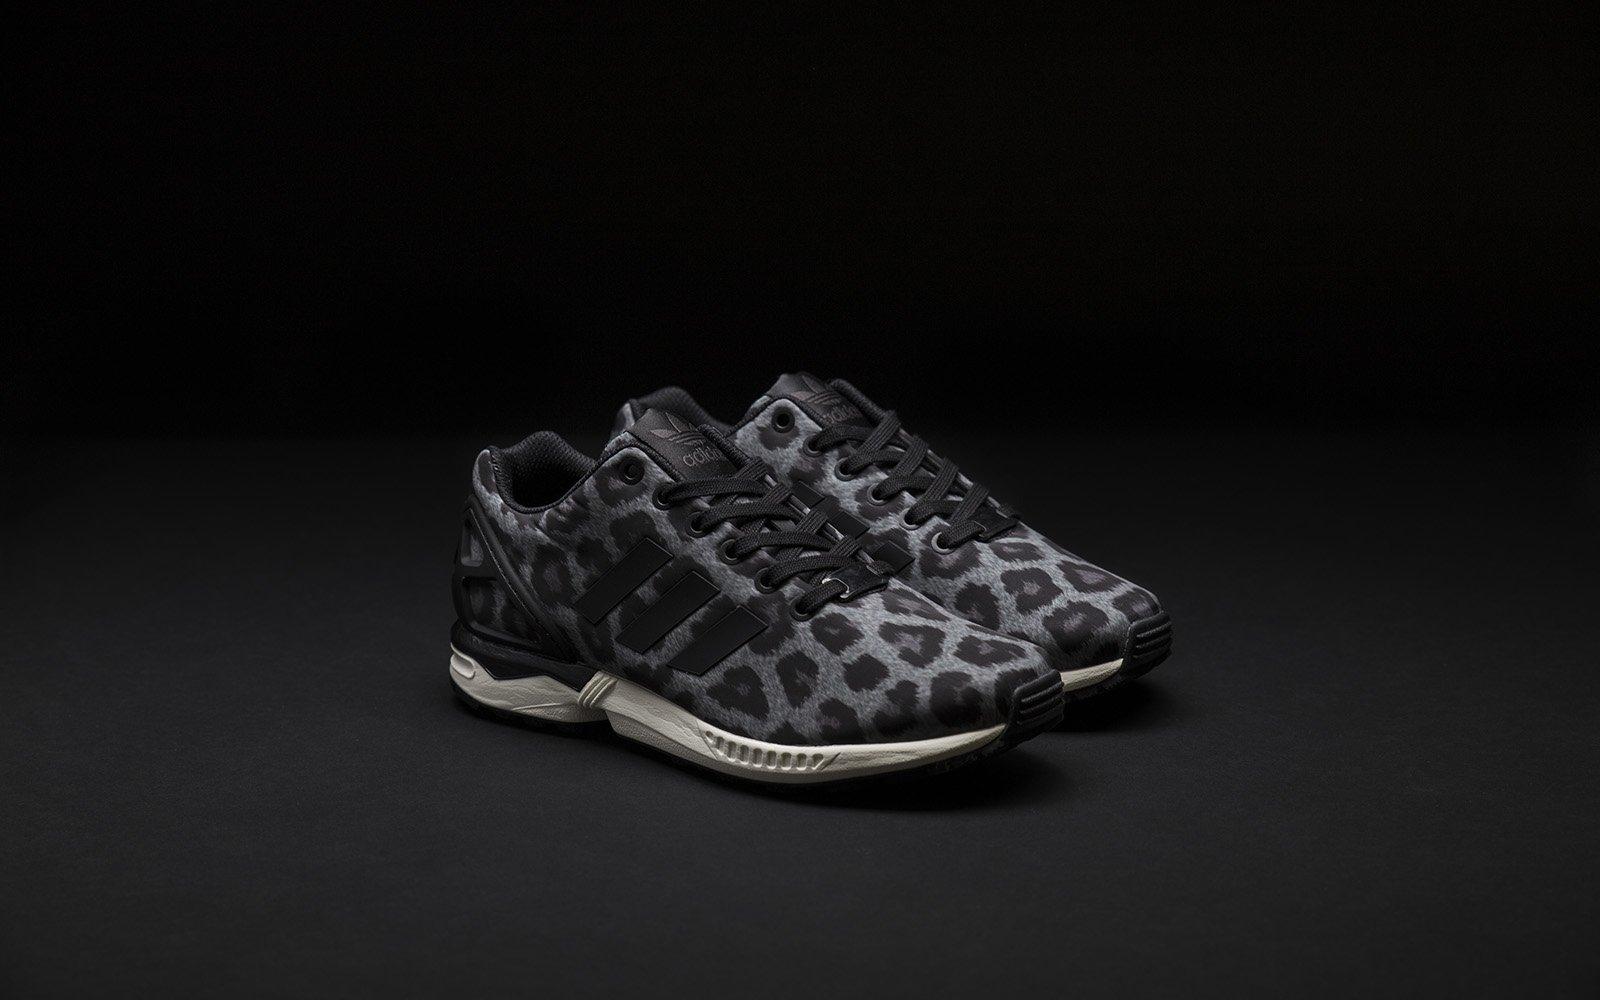 adidas ZX Flux - Snow Leopard - M21667 - SNS | sneakers ...